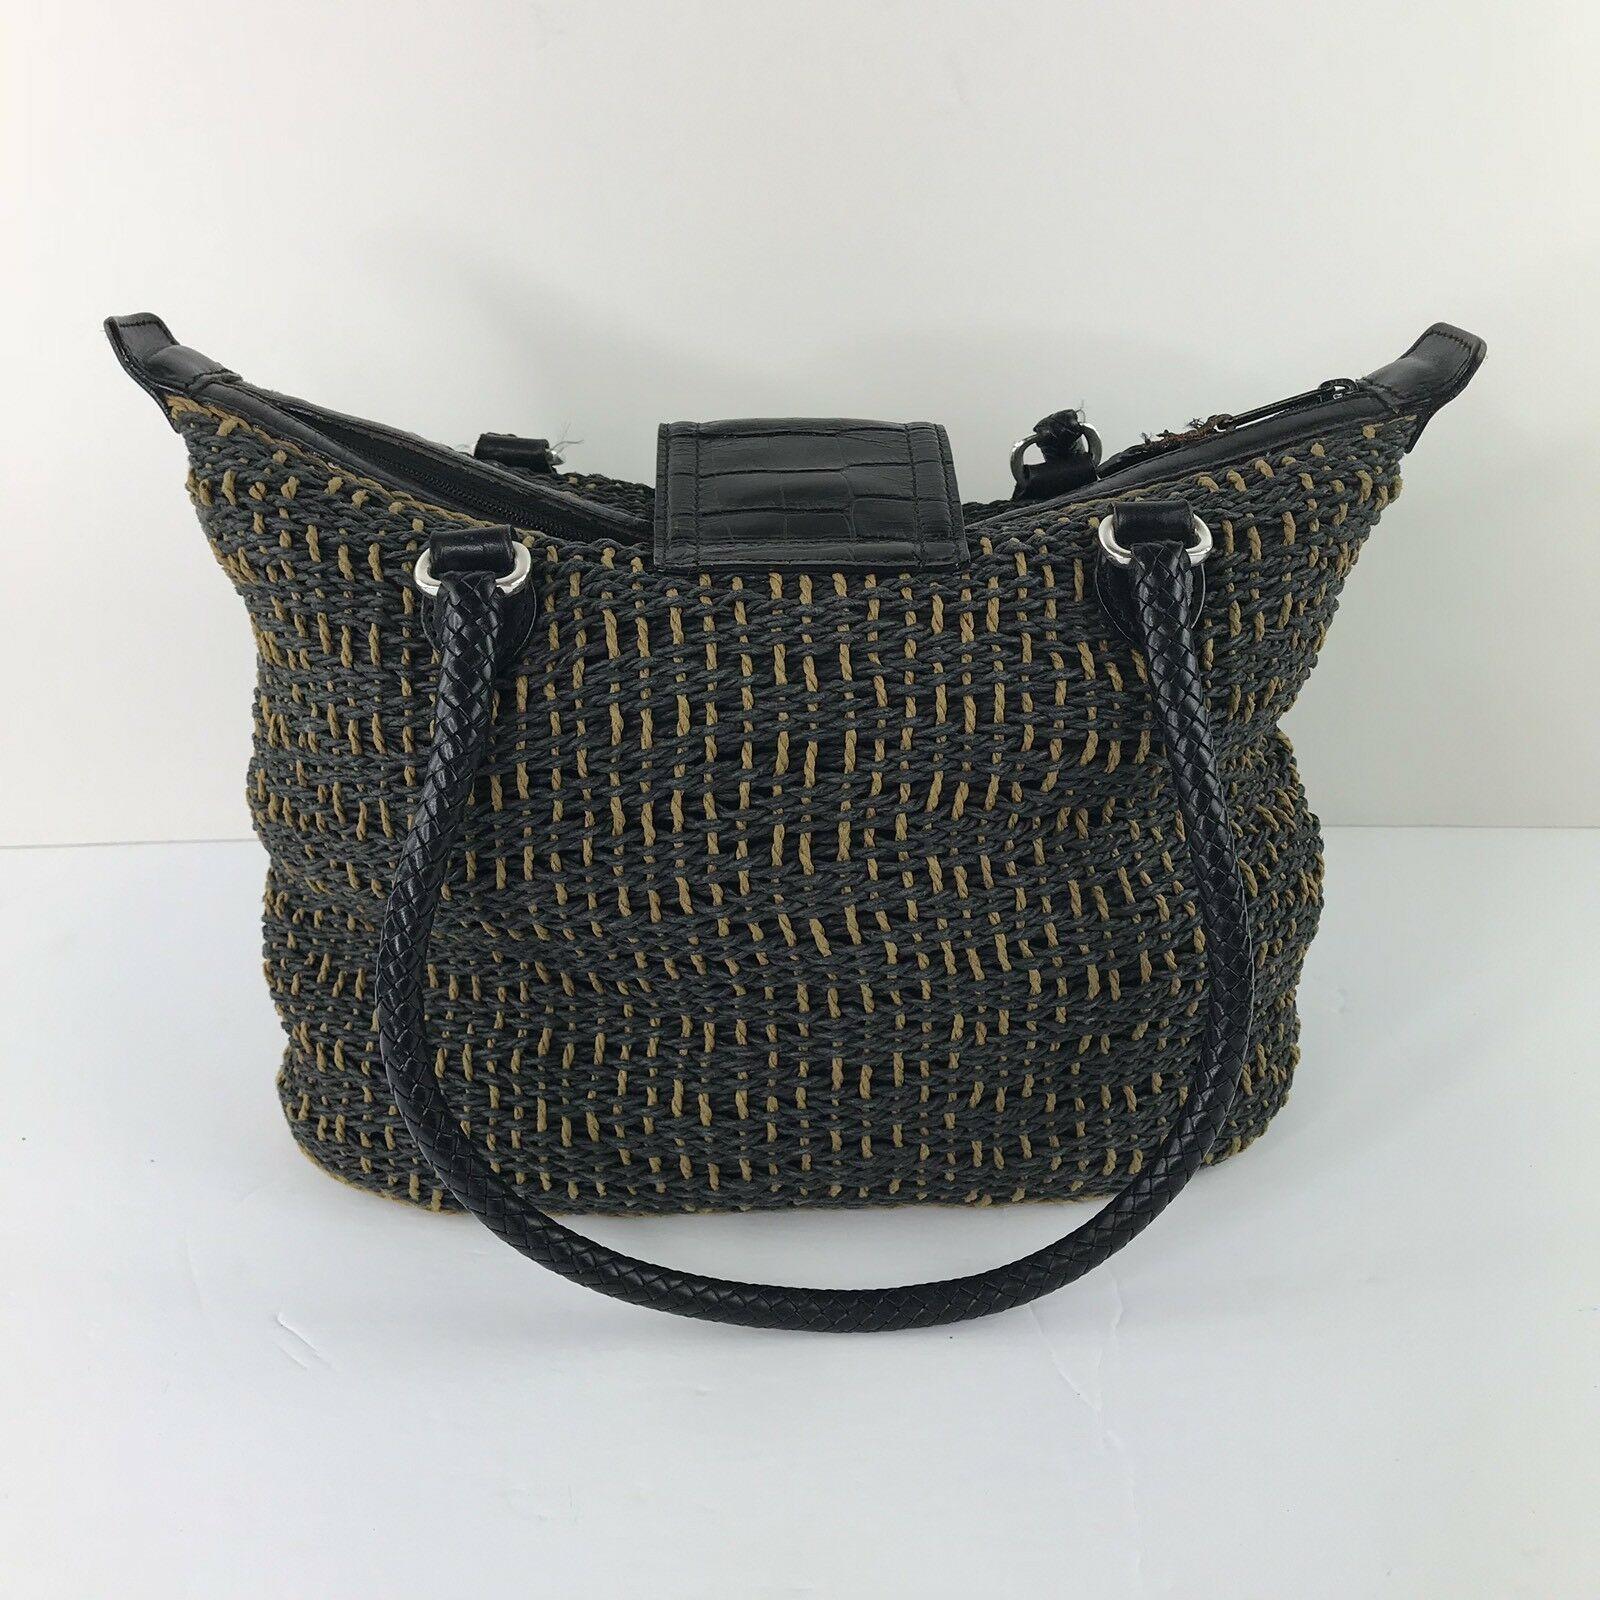 Brighton Black & Camel Woven Cord Tote Purse Braided Leather Handle BoHo Z14